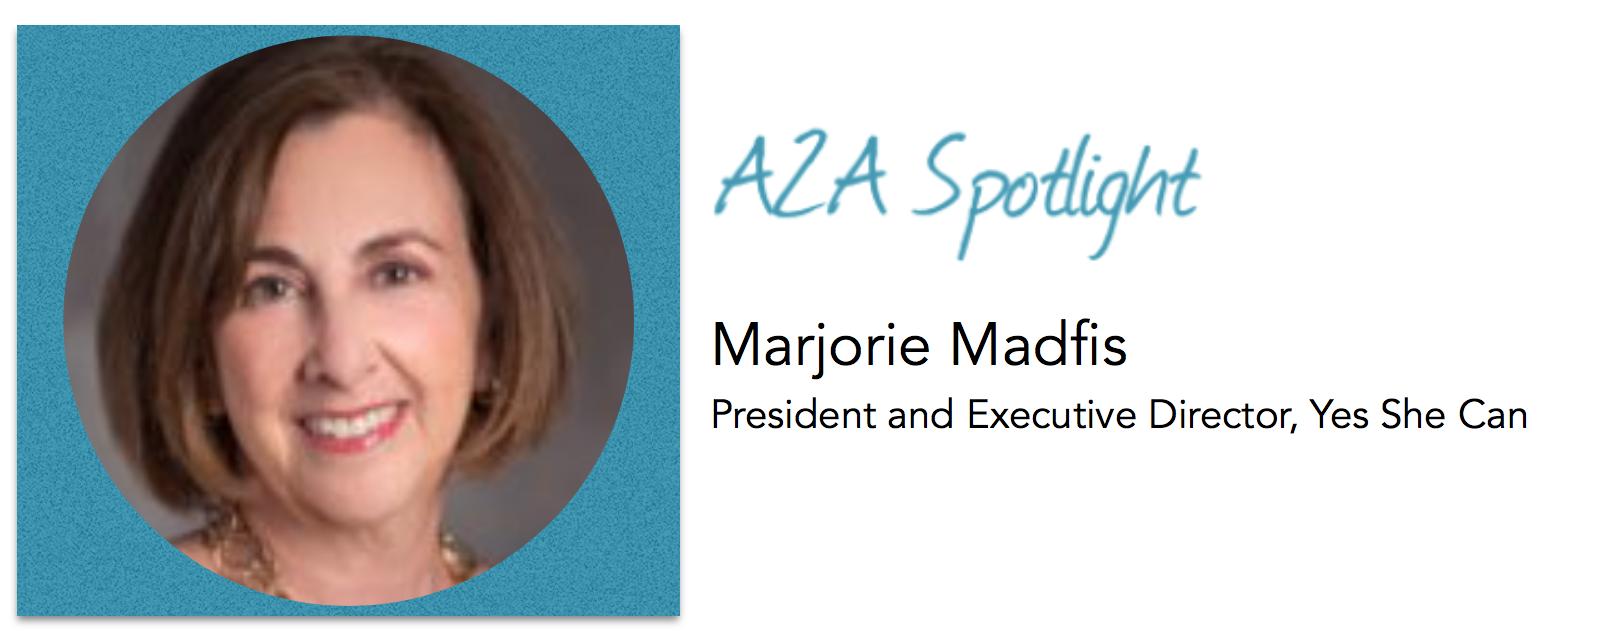 Spotlight – Marjorie Madfis